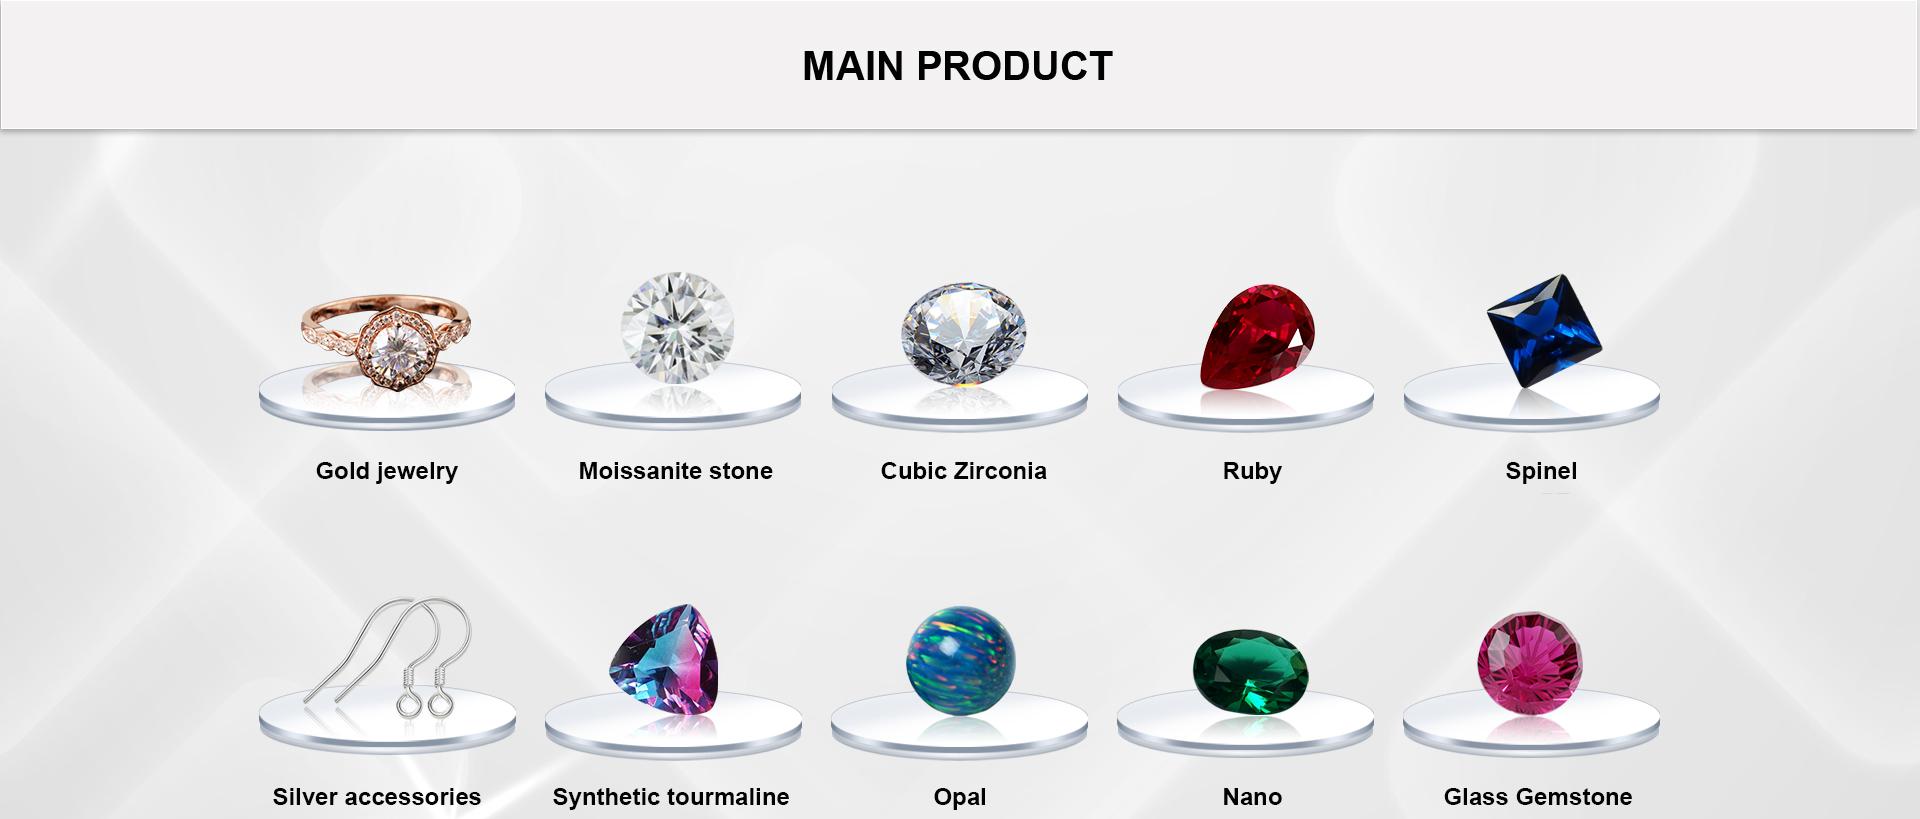 6cd52a5f760a3 Wuzhou Provence Jewelry Co., Ltd. - Gold Jewelry, Moissanite Stone